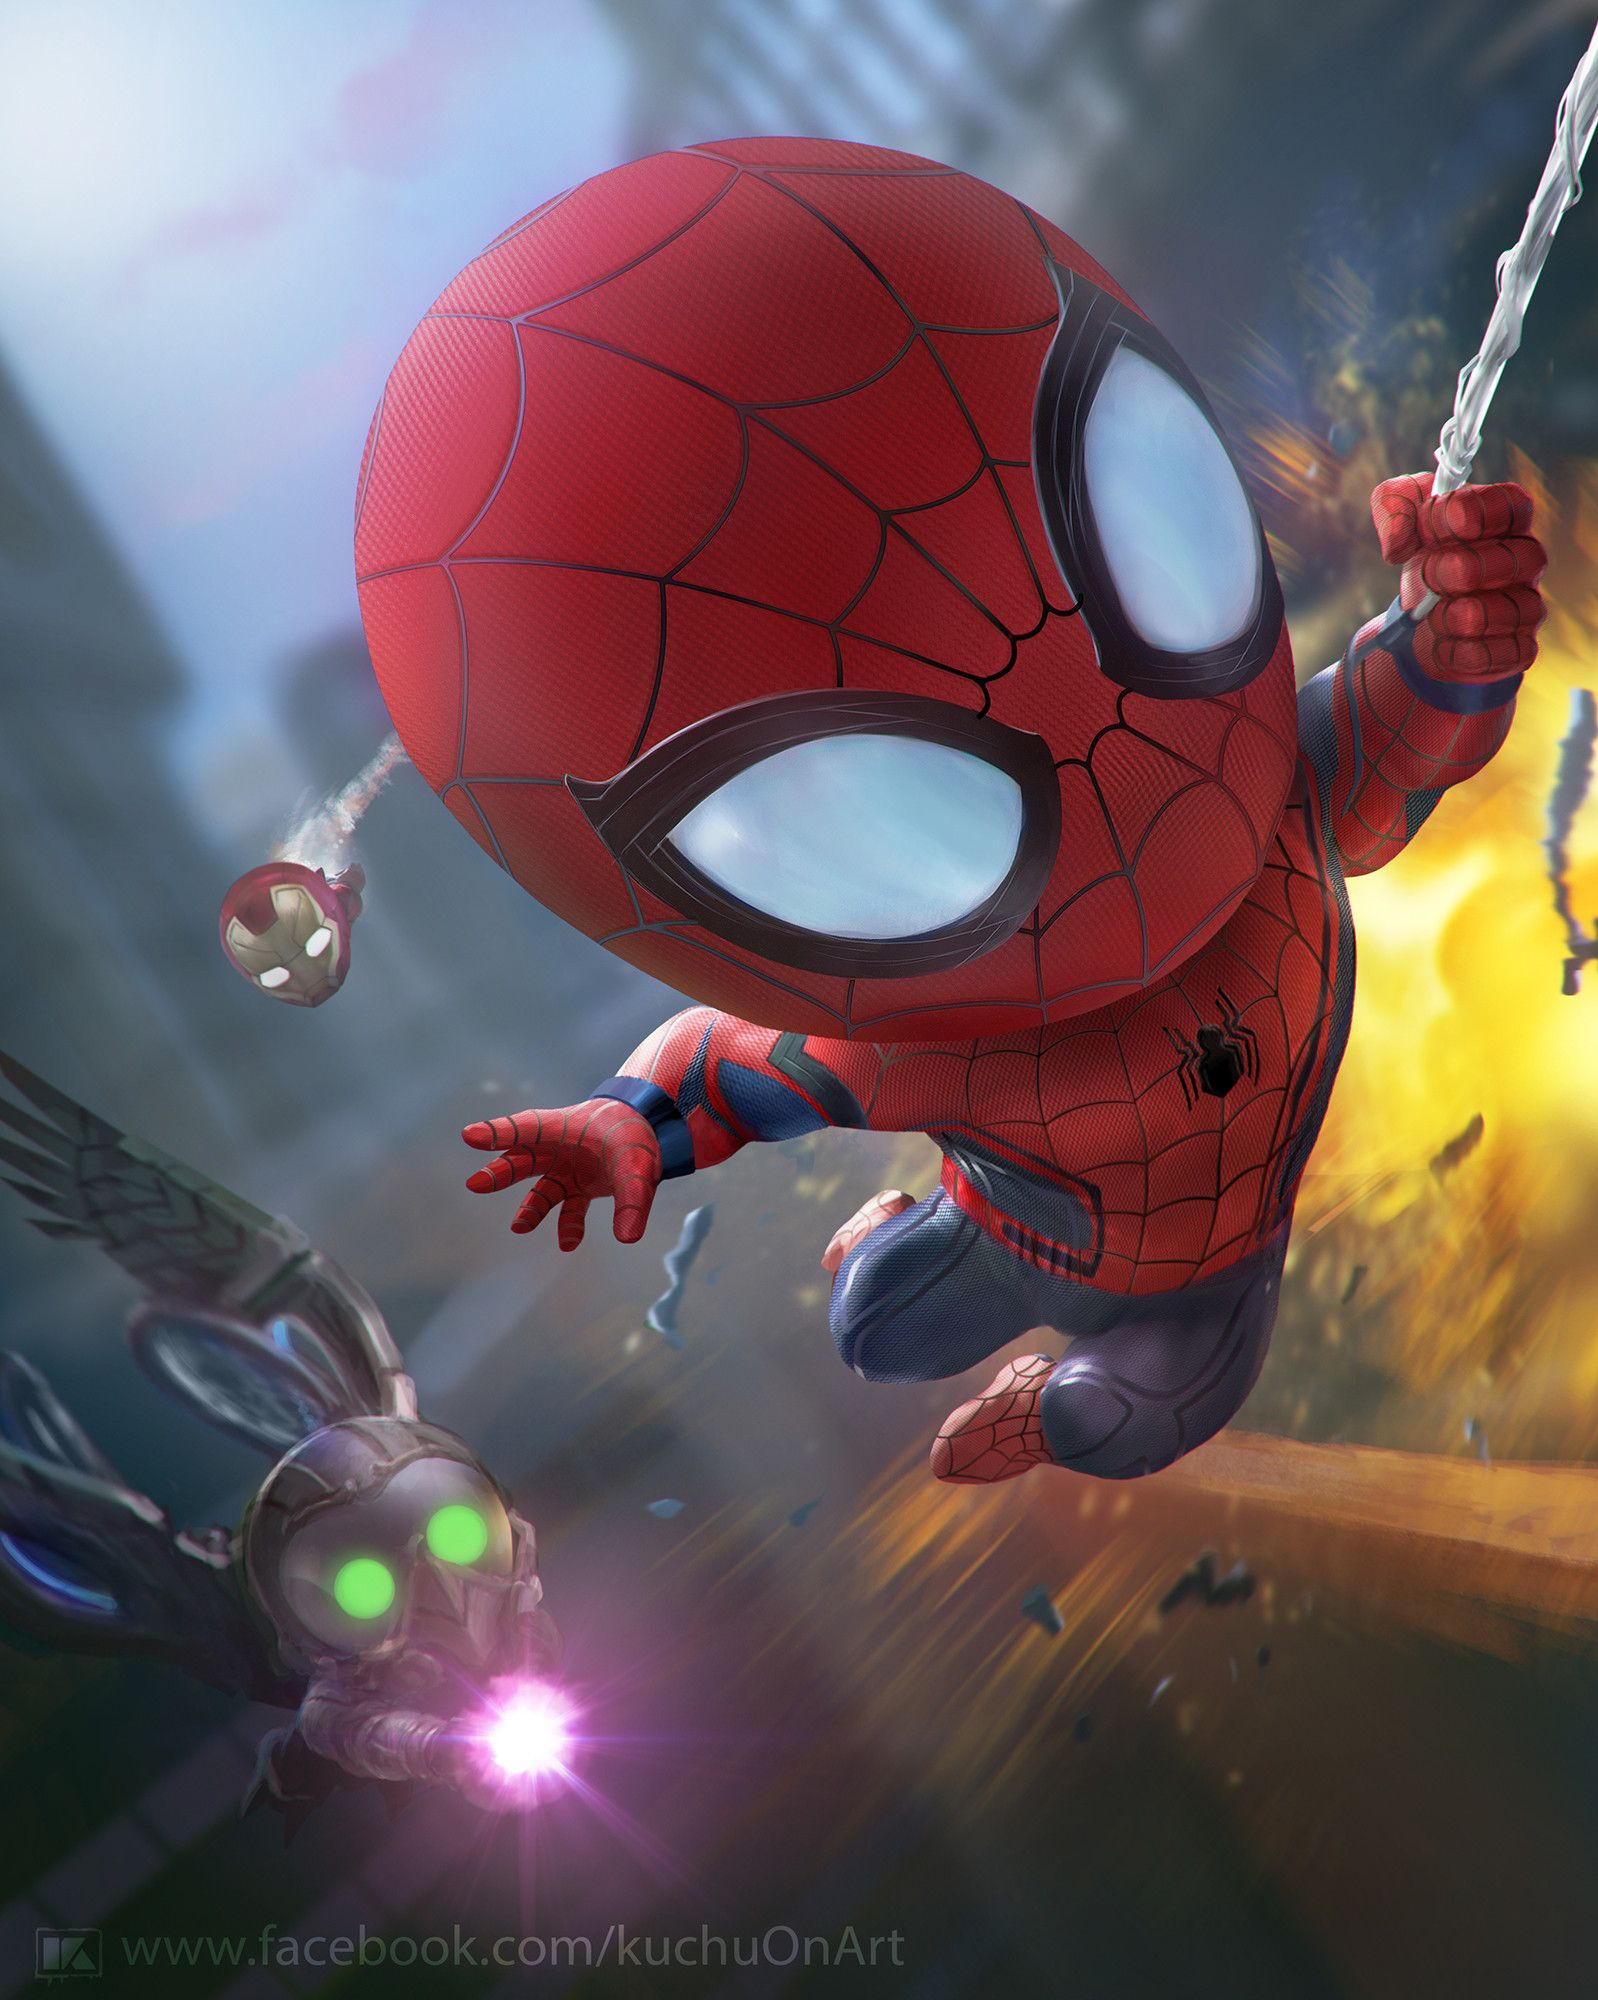 Chibi Hulk Cute Wallpaper Spider Man Homecoming Fan Art Hero Haaa Pinterest